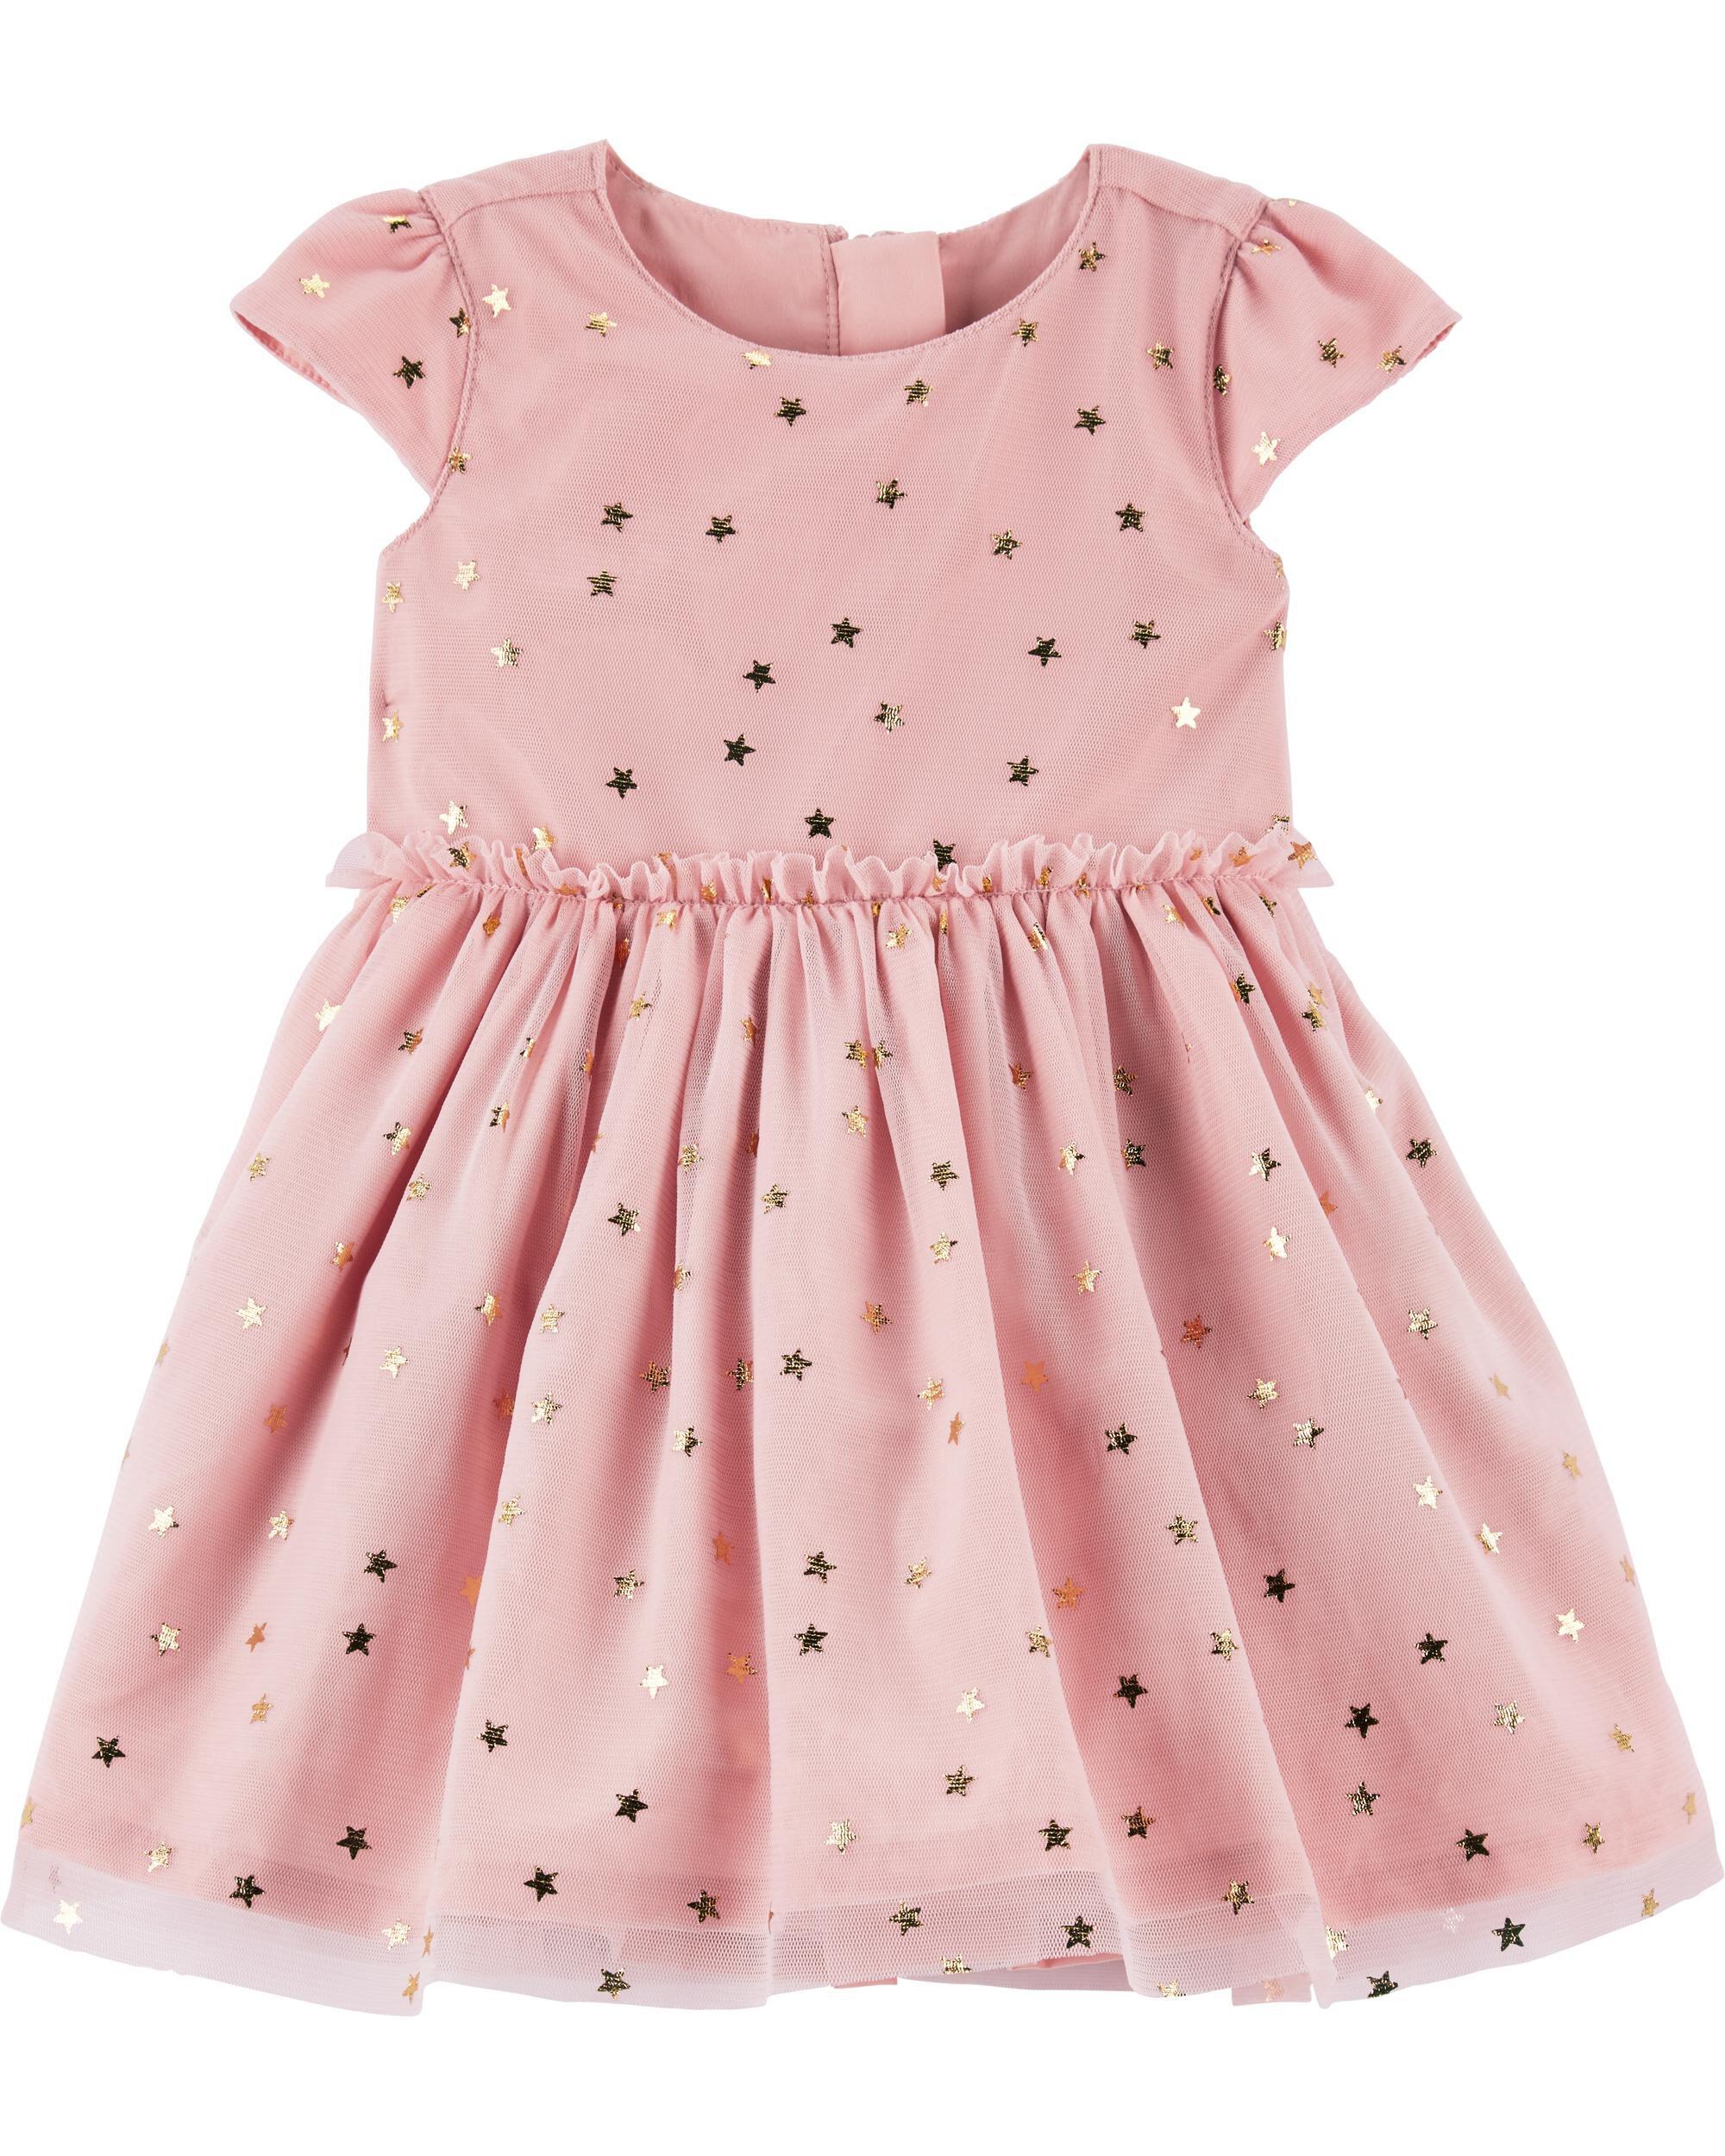 1c0b7bb01c55 Star Tulle Holiday Dress